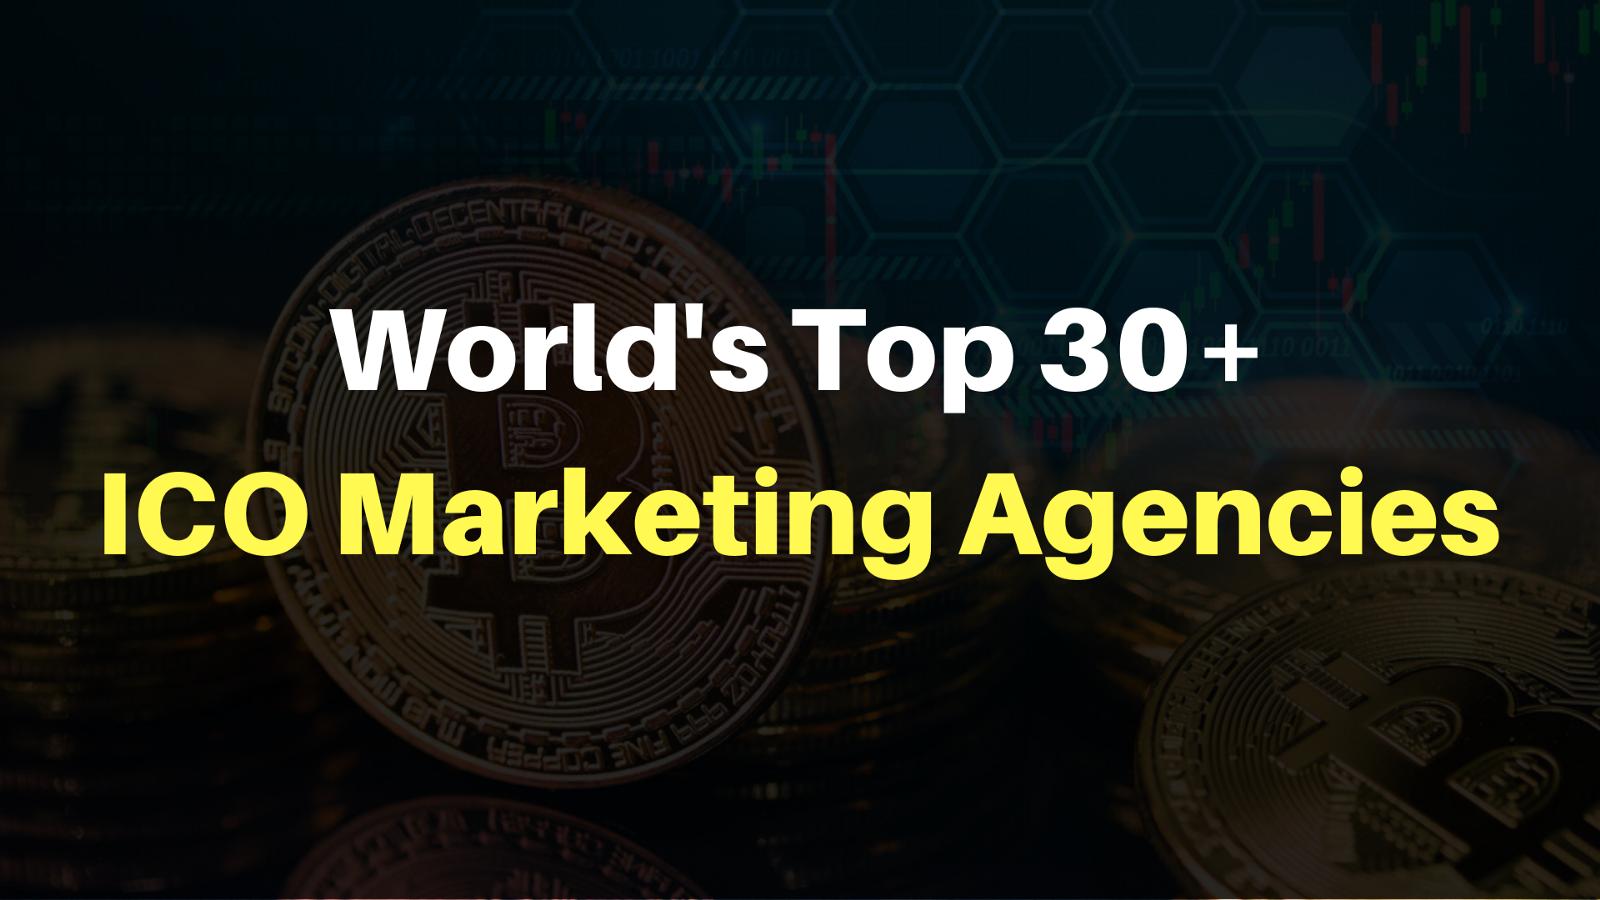 Top 30+ ICO Marketing Agencies & ICO Development Companies